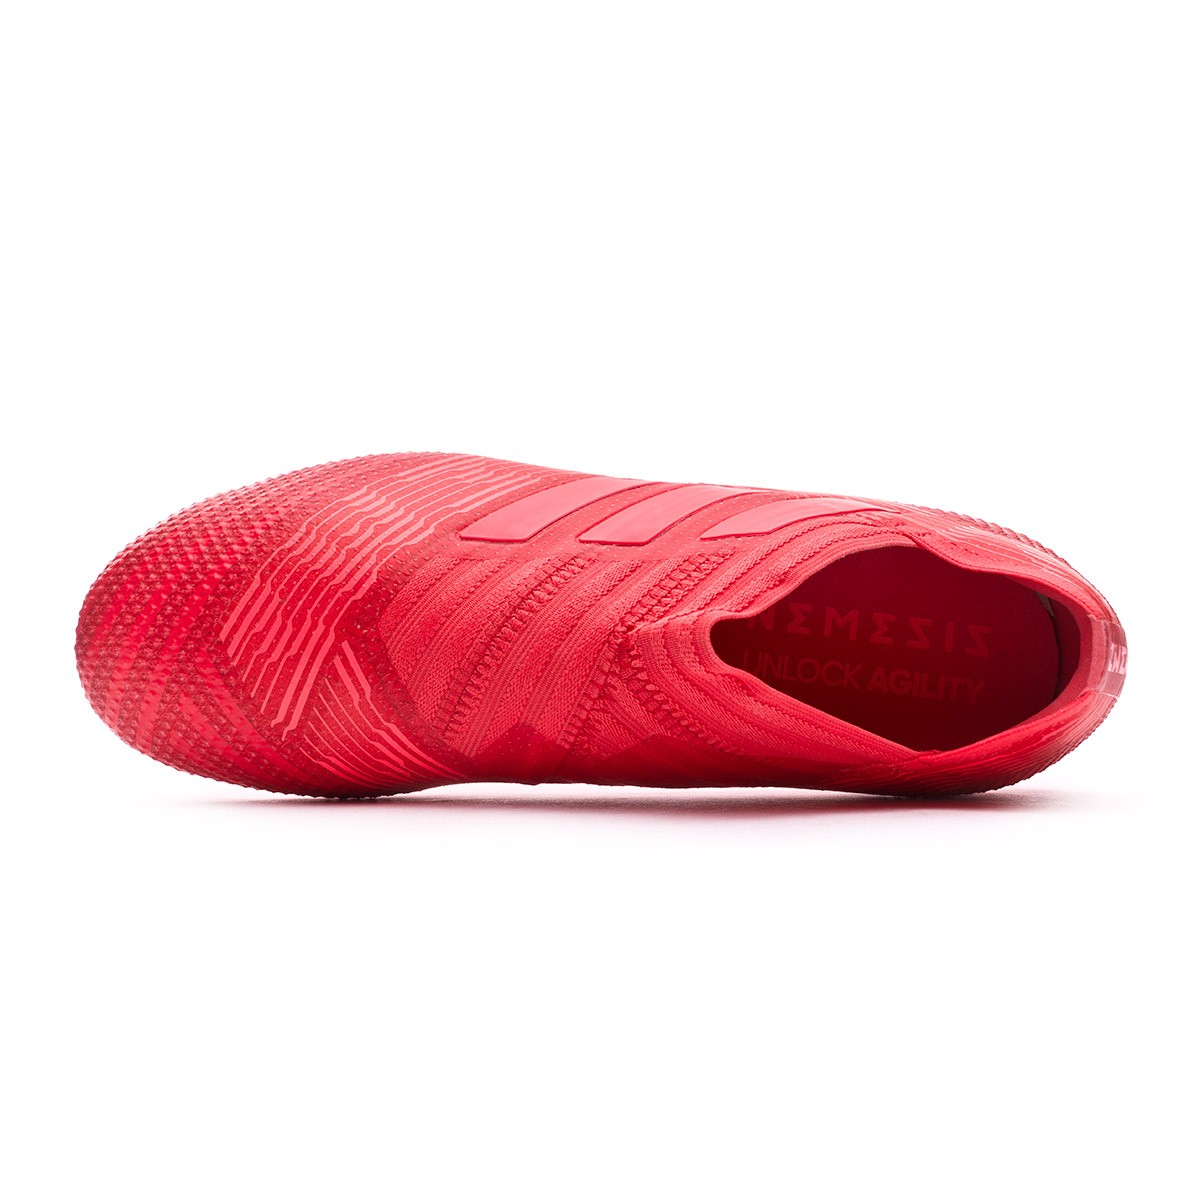 a2049bda440 Football Boots adidas Kids Nemeziz 17+ 360 Agility FG Real coral-Red zest-Real  coral - Football store Fútbol Emotion